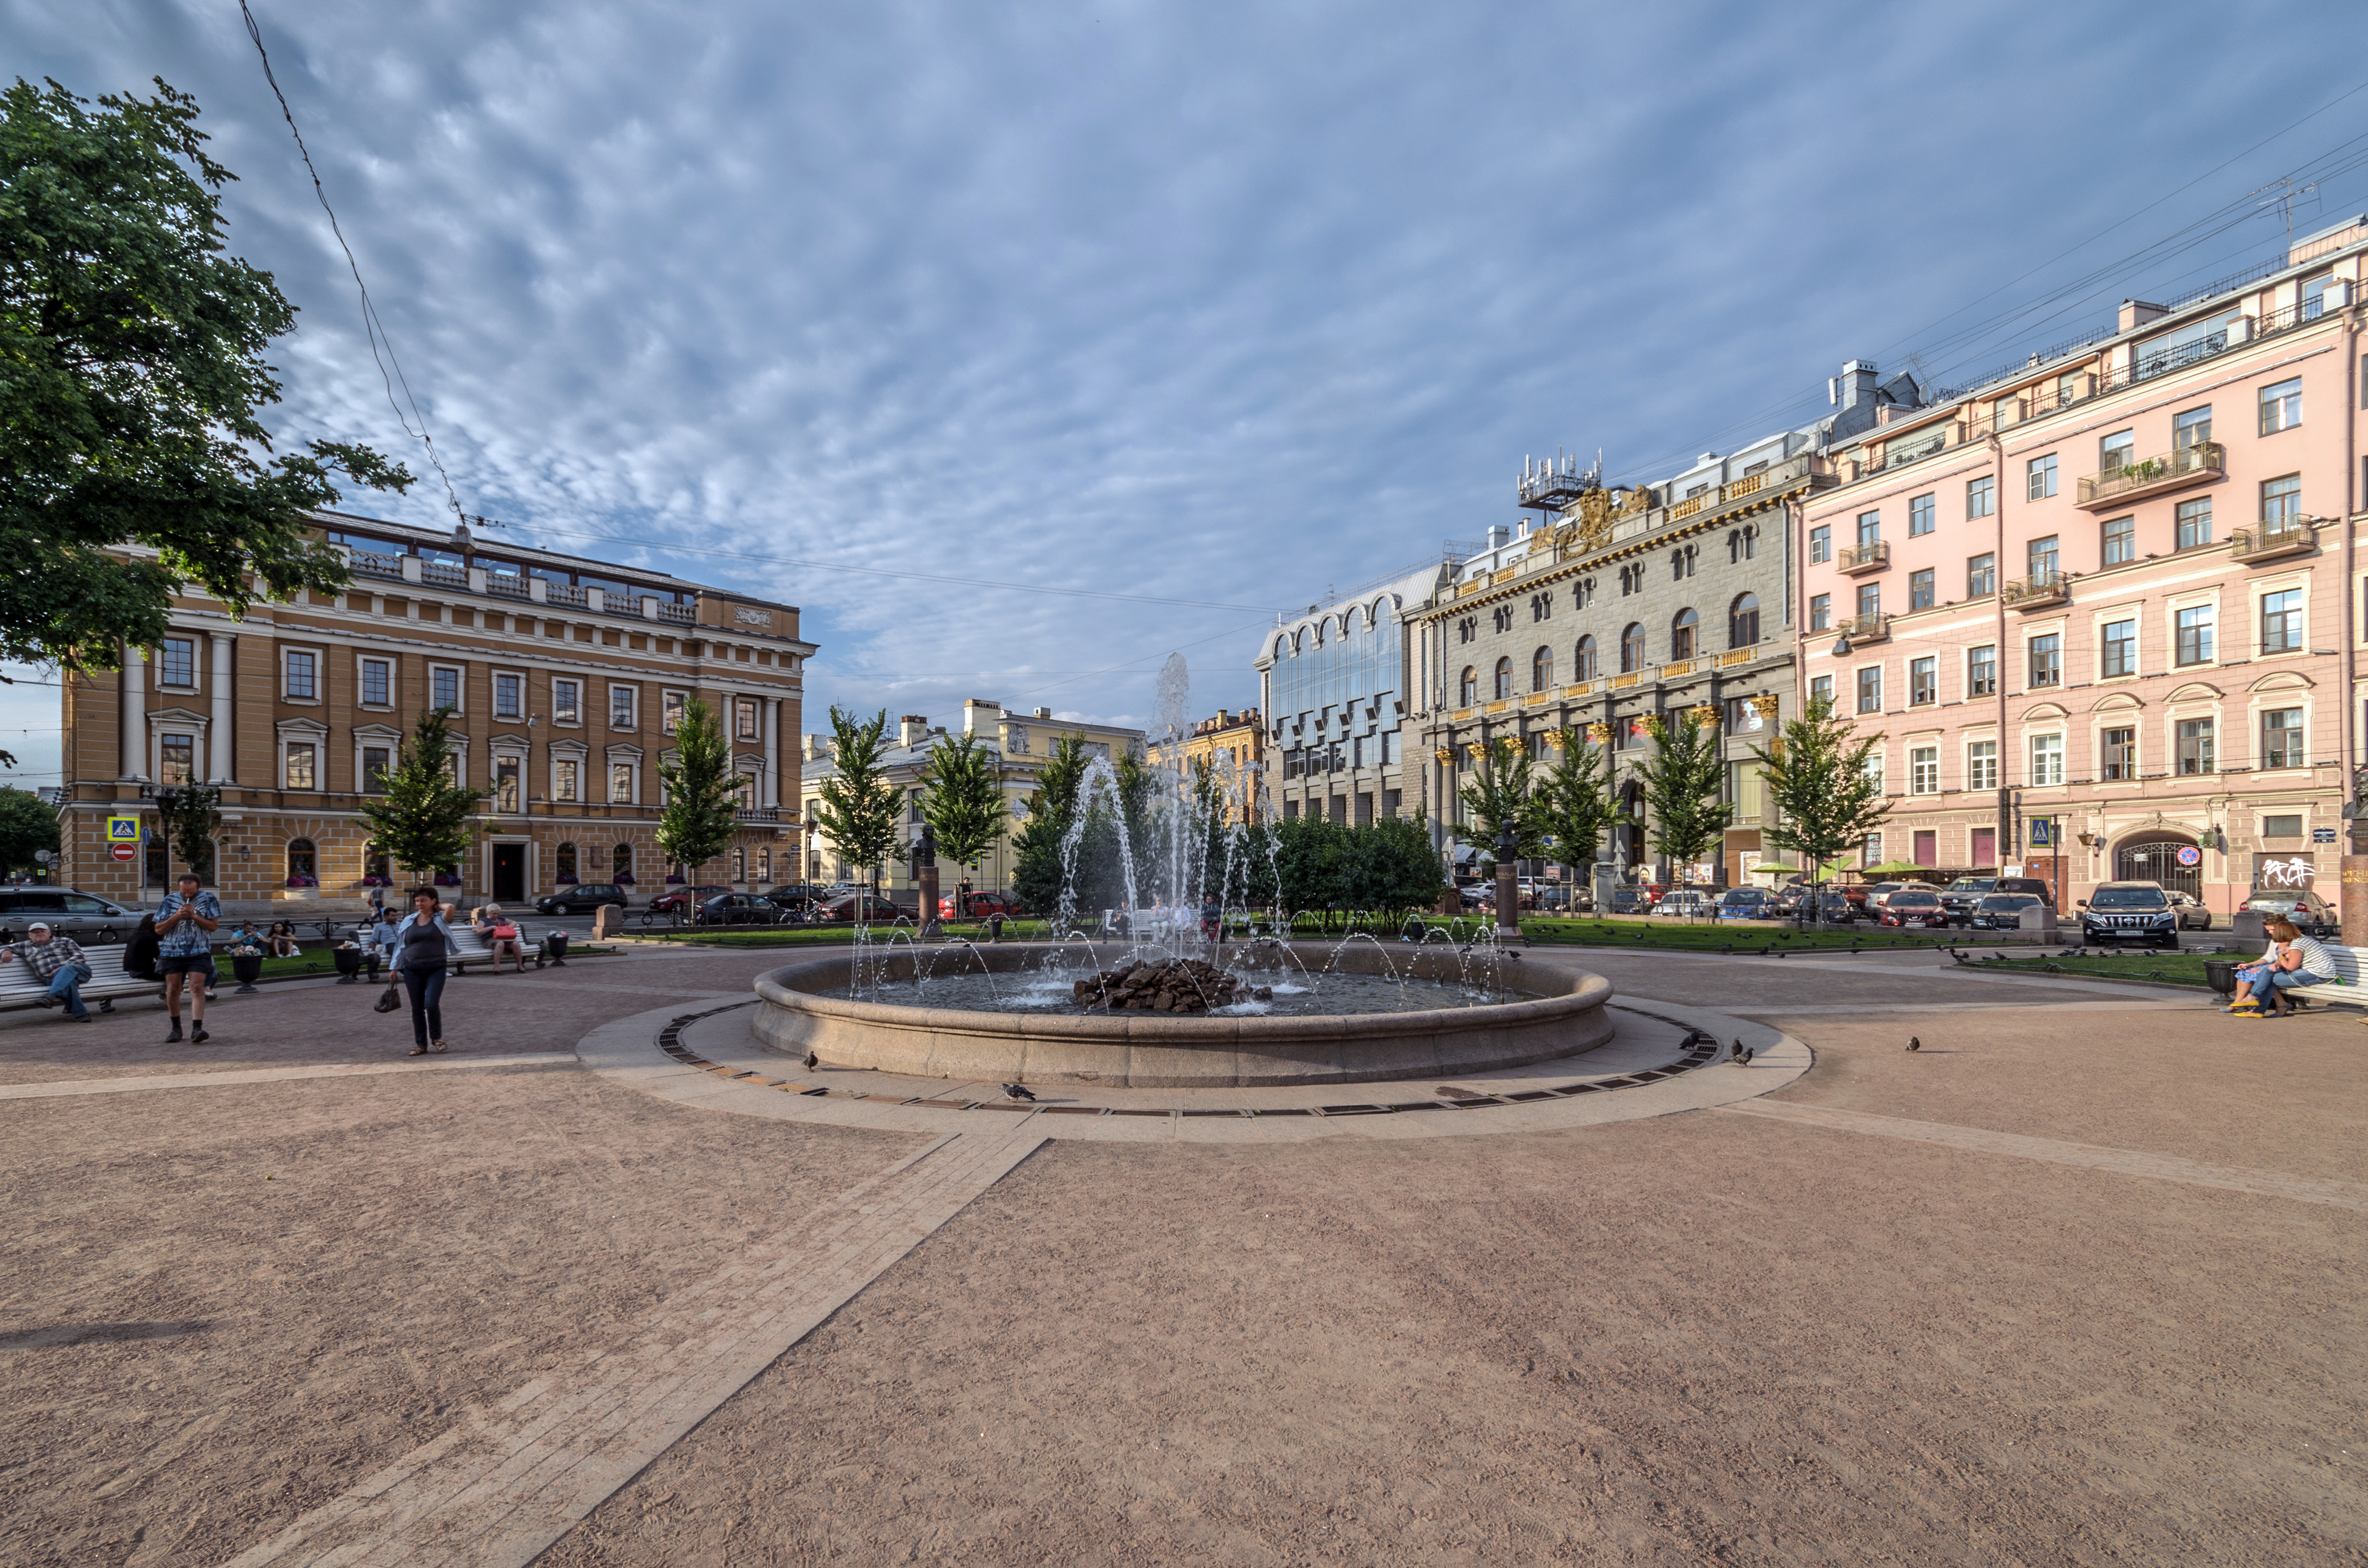 Файл:Manezhnaya Square SPB 01.jpg — Википедия